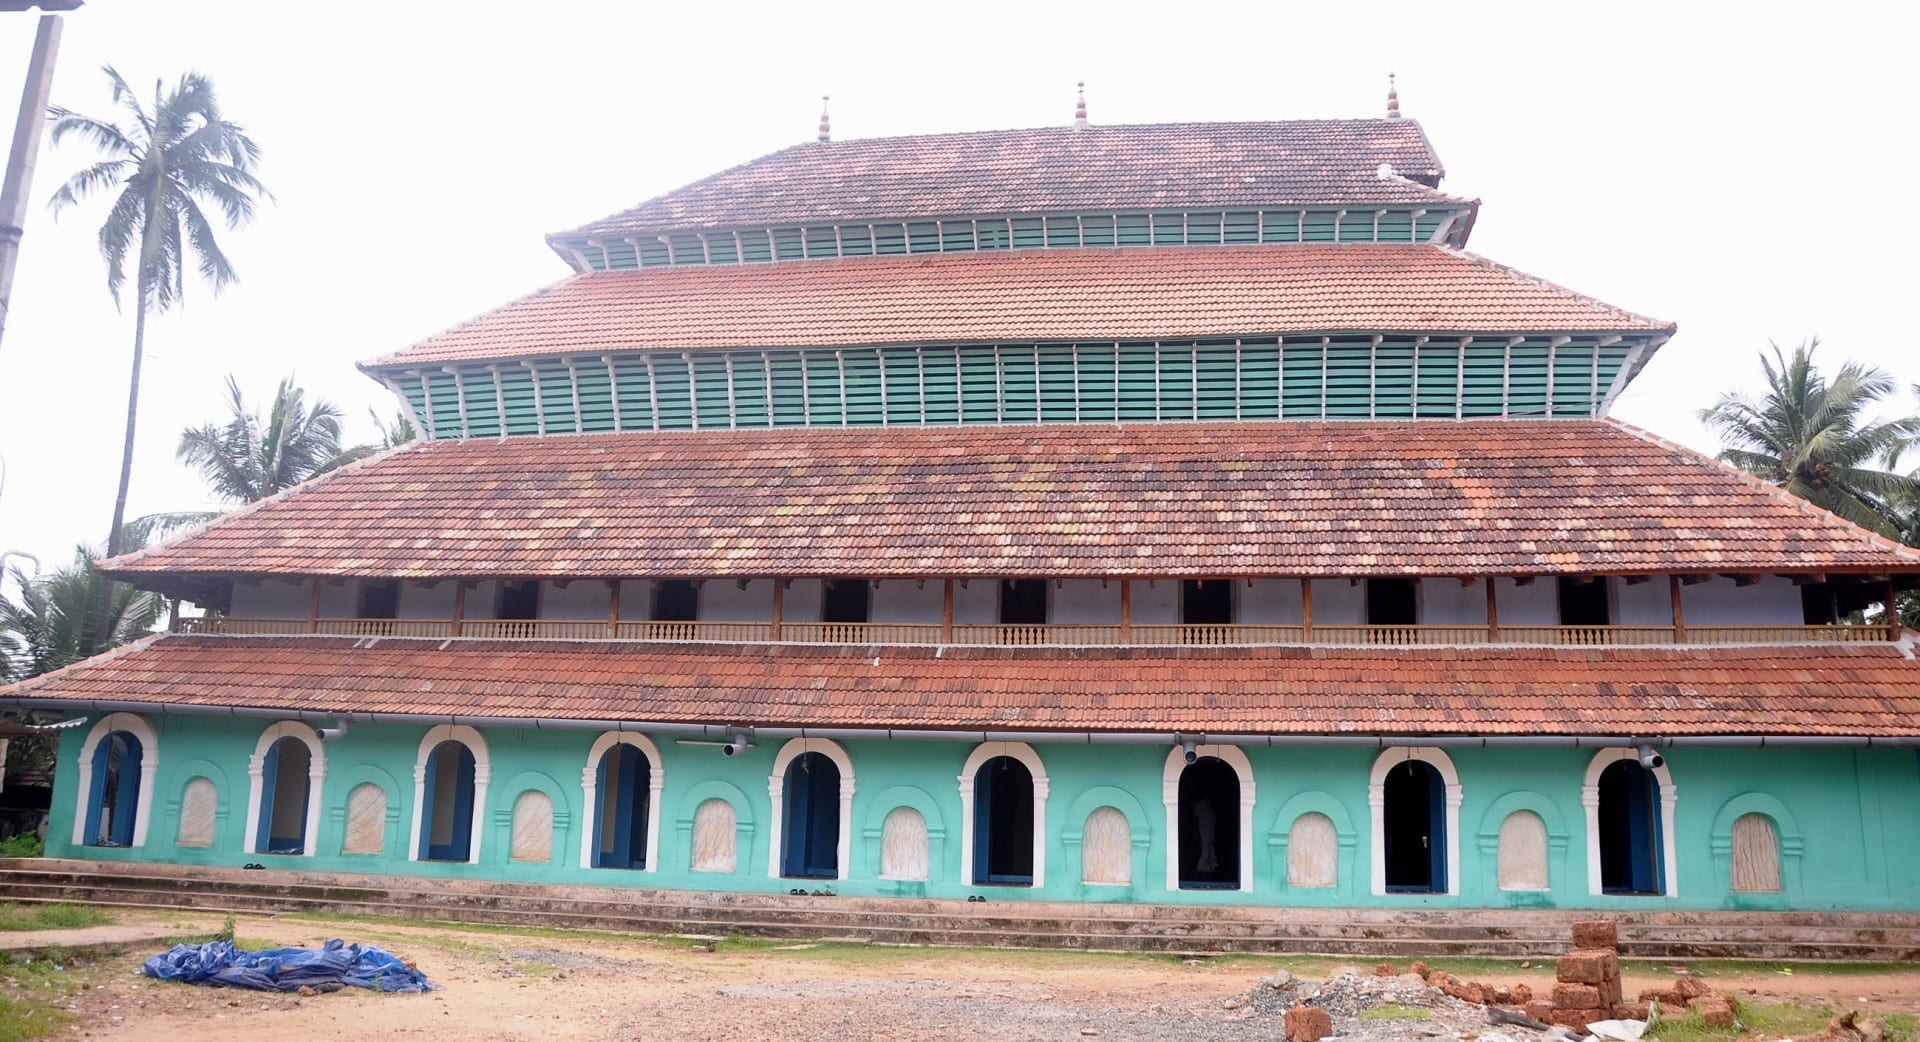 Mishkal Masjidh, Kuttichira Kozhikode India